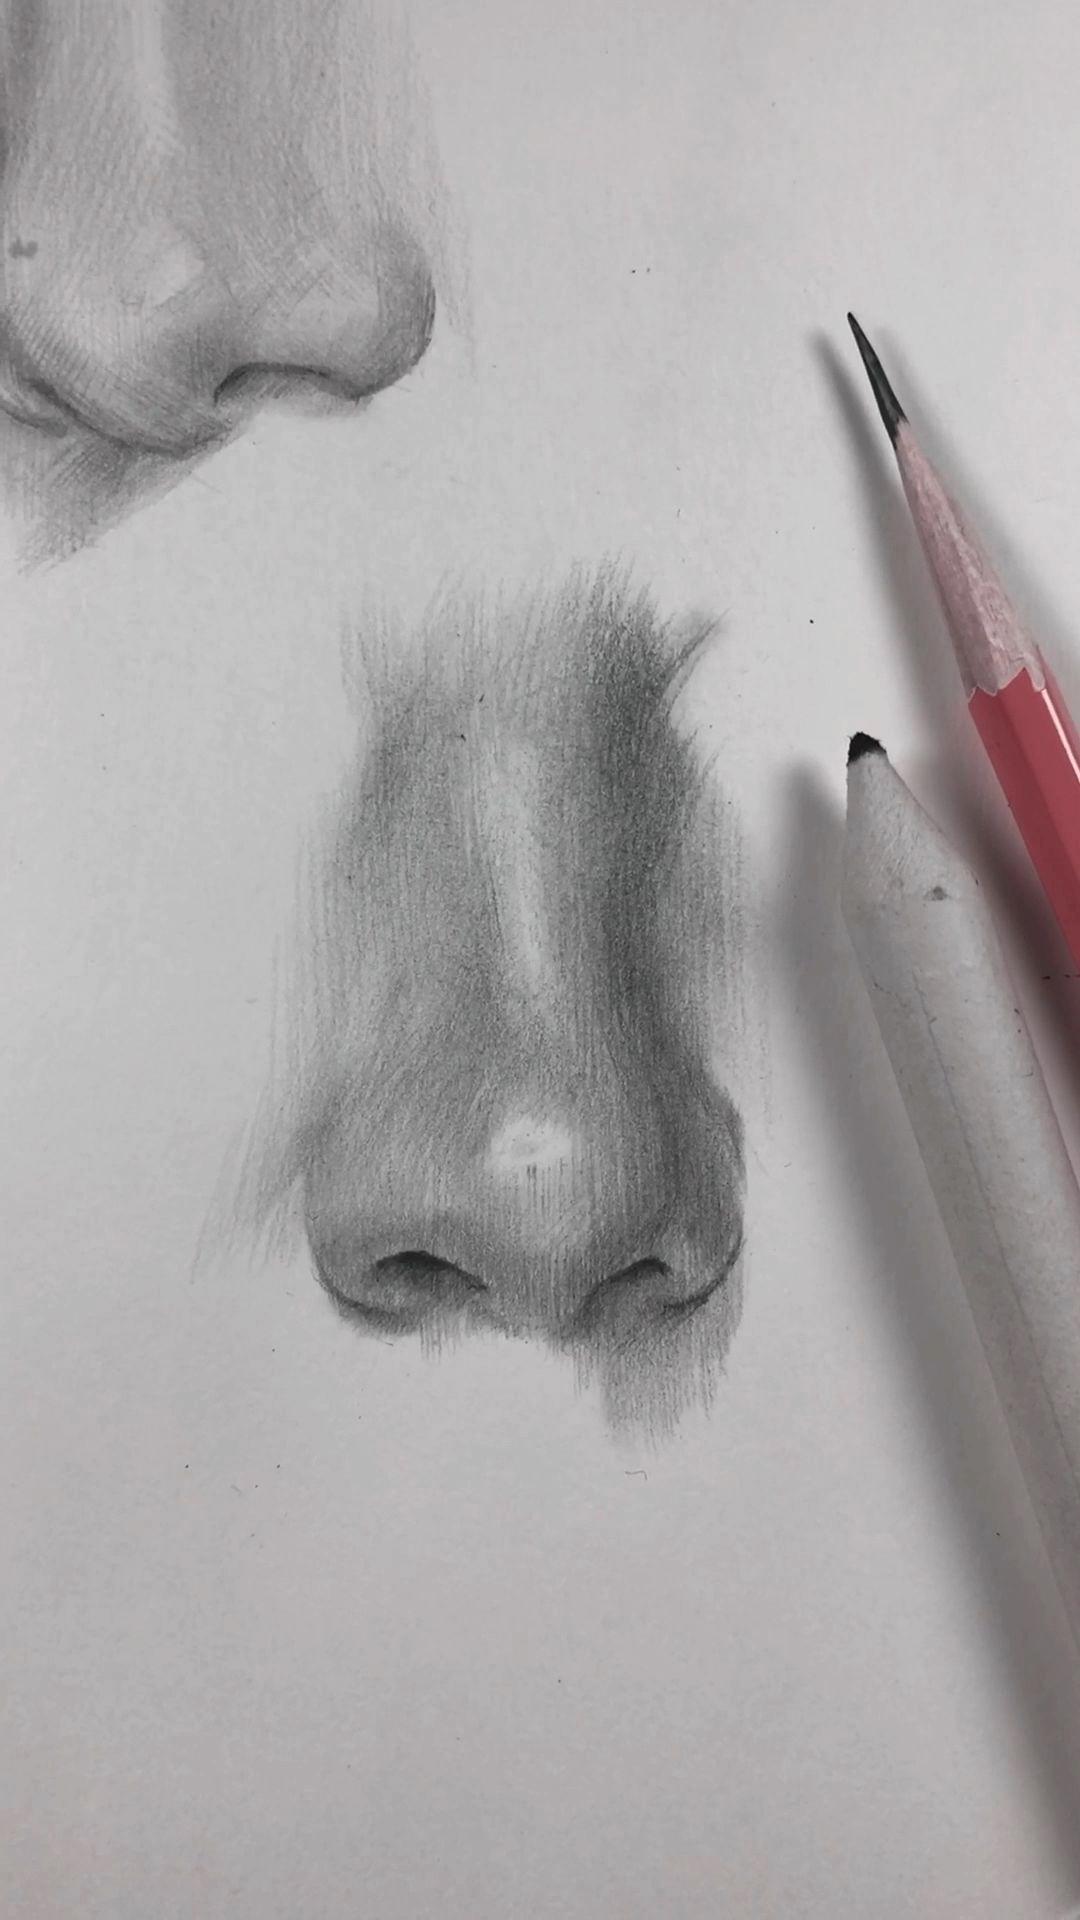 Como Saco La Napias In 2020 Nose Drawing Pencil Art Drawings Art Drawings Sketches